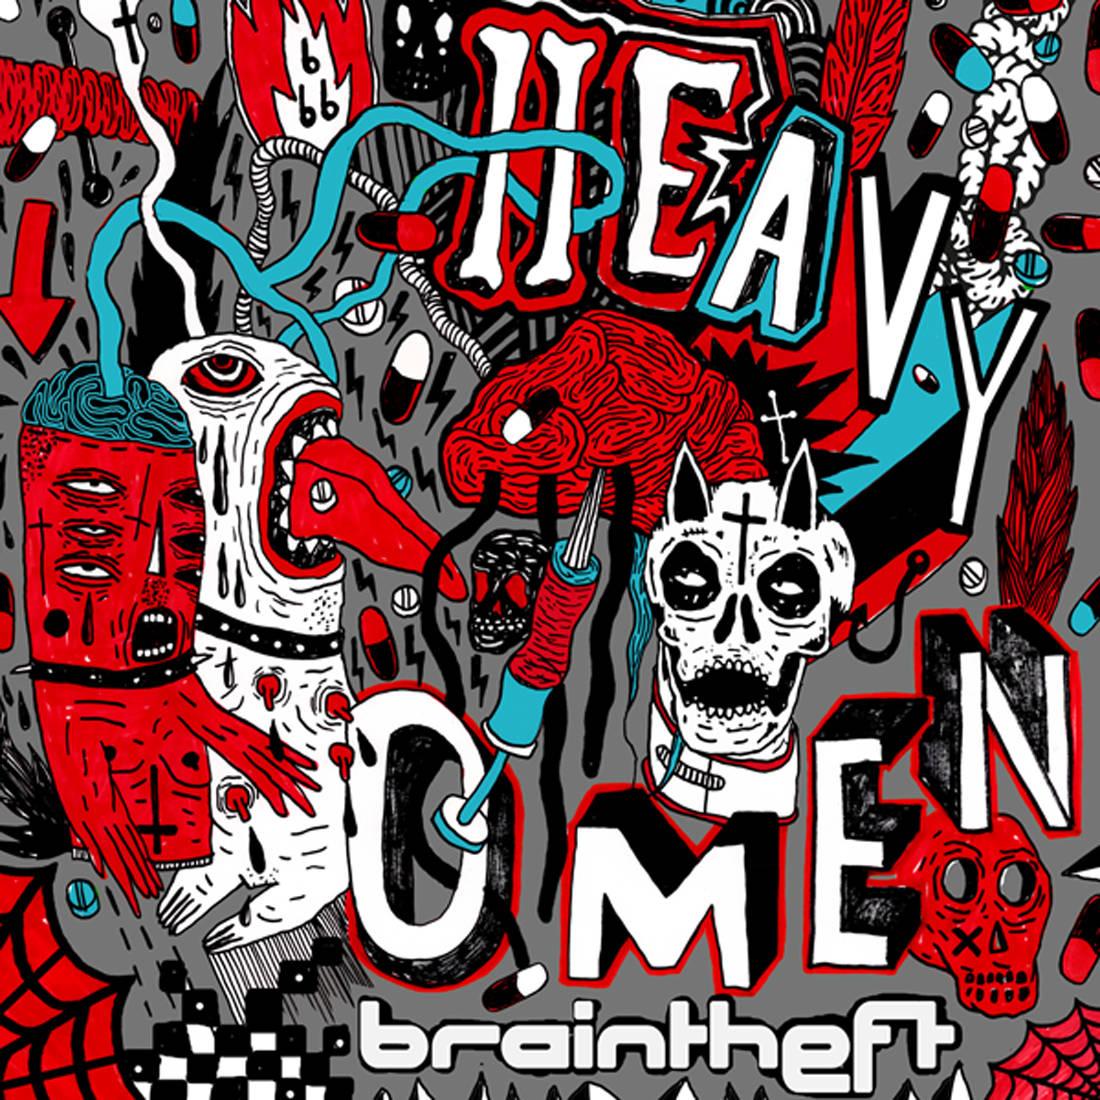 Braintheft Heavy Omen Odgprod